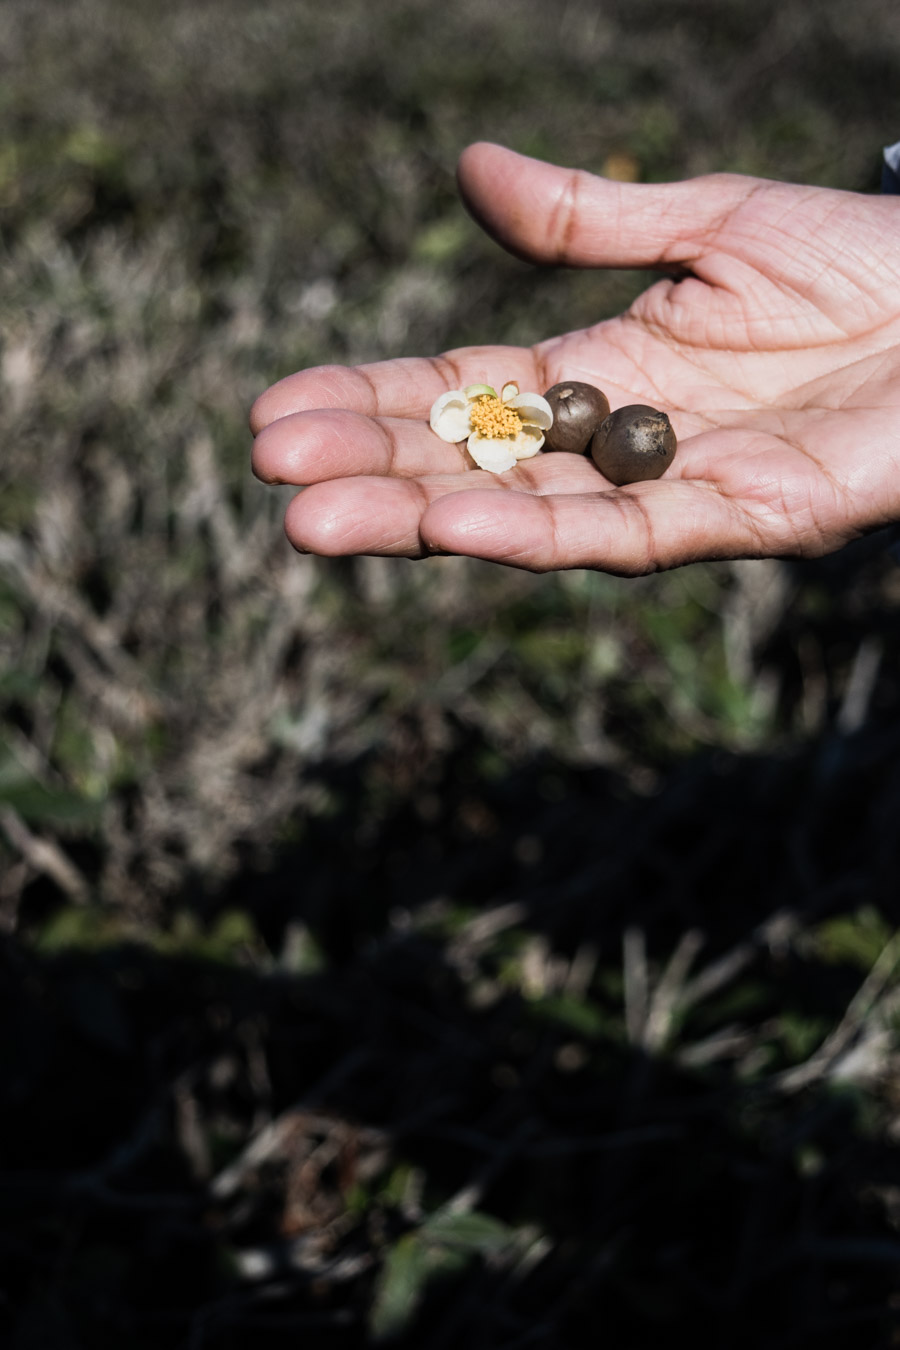 Tea seeds and flowers